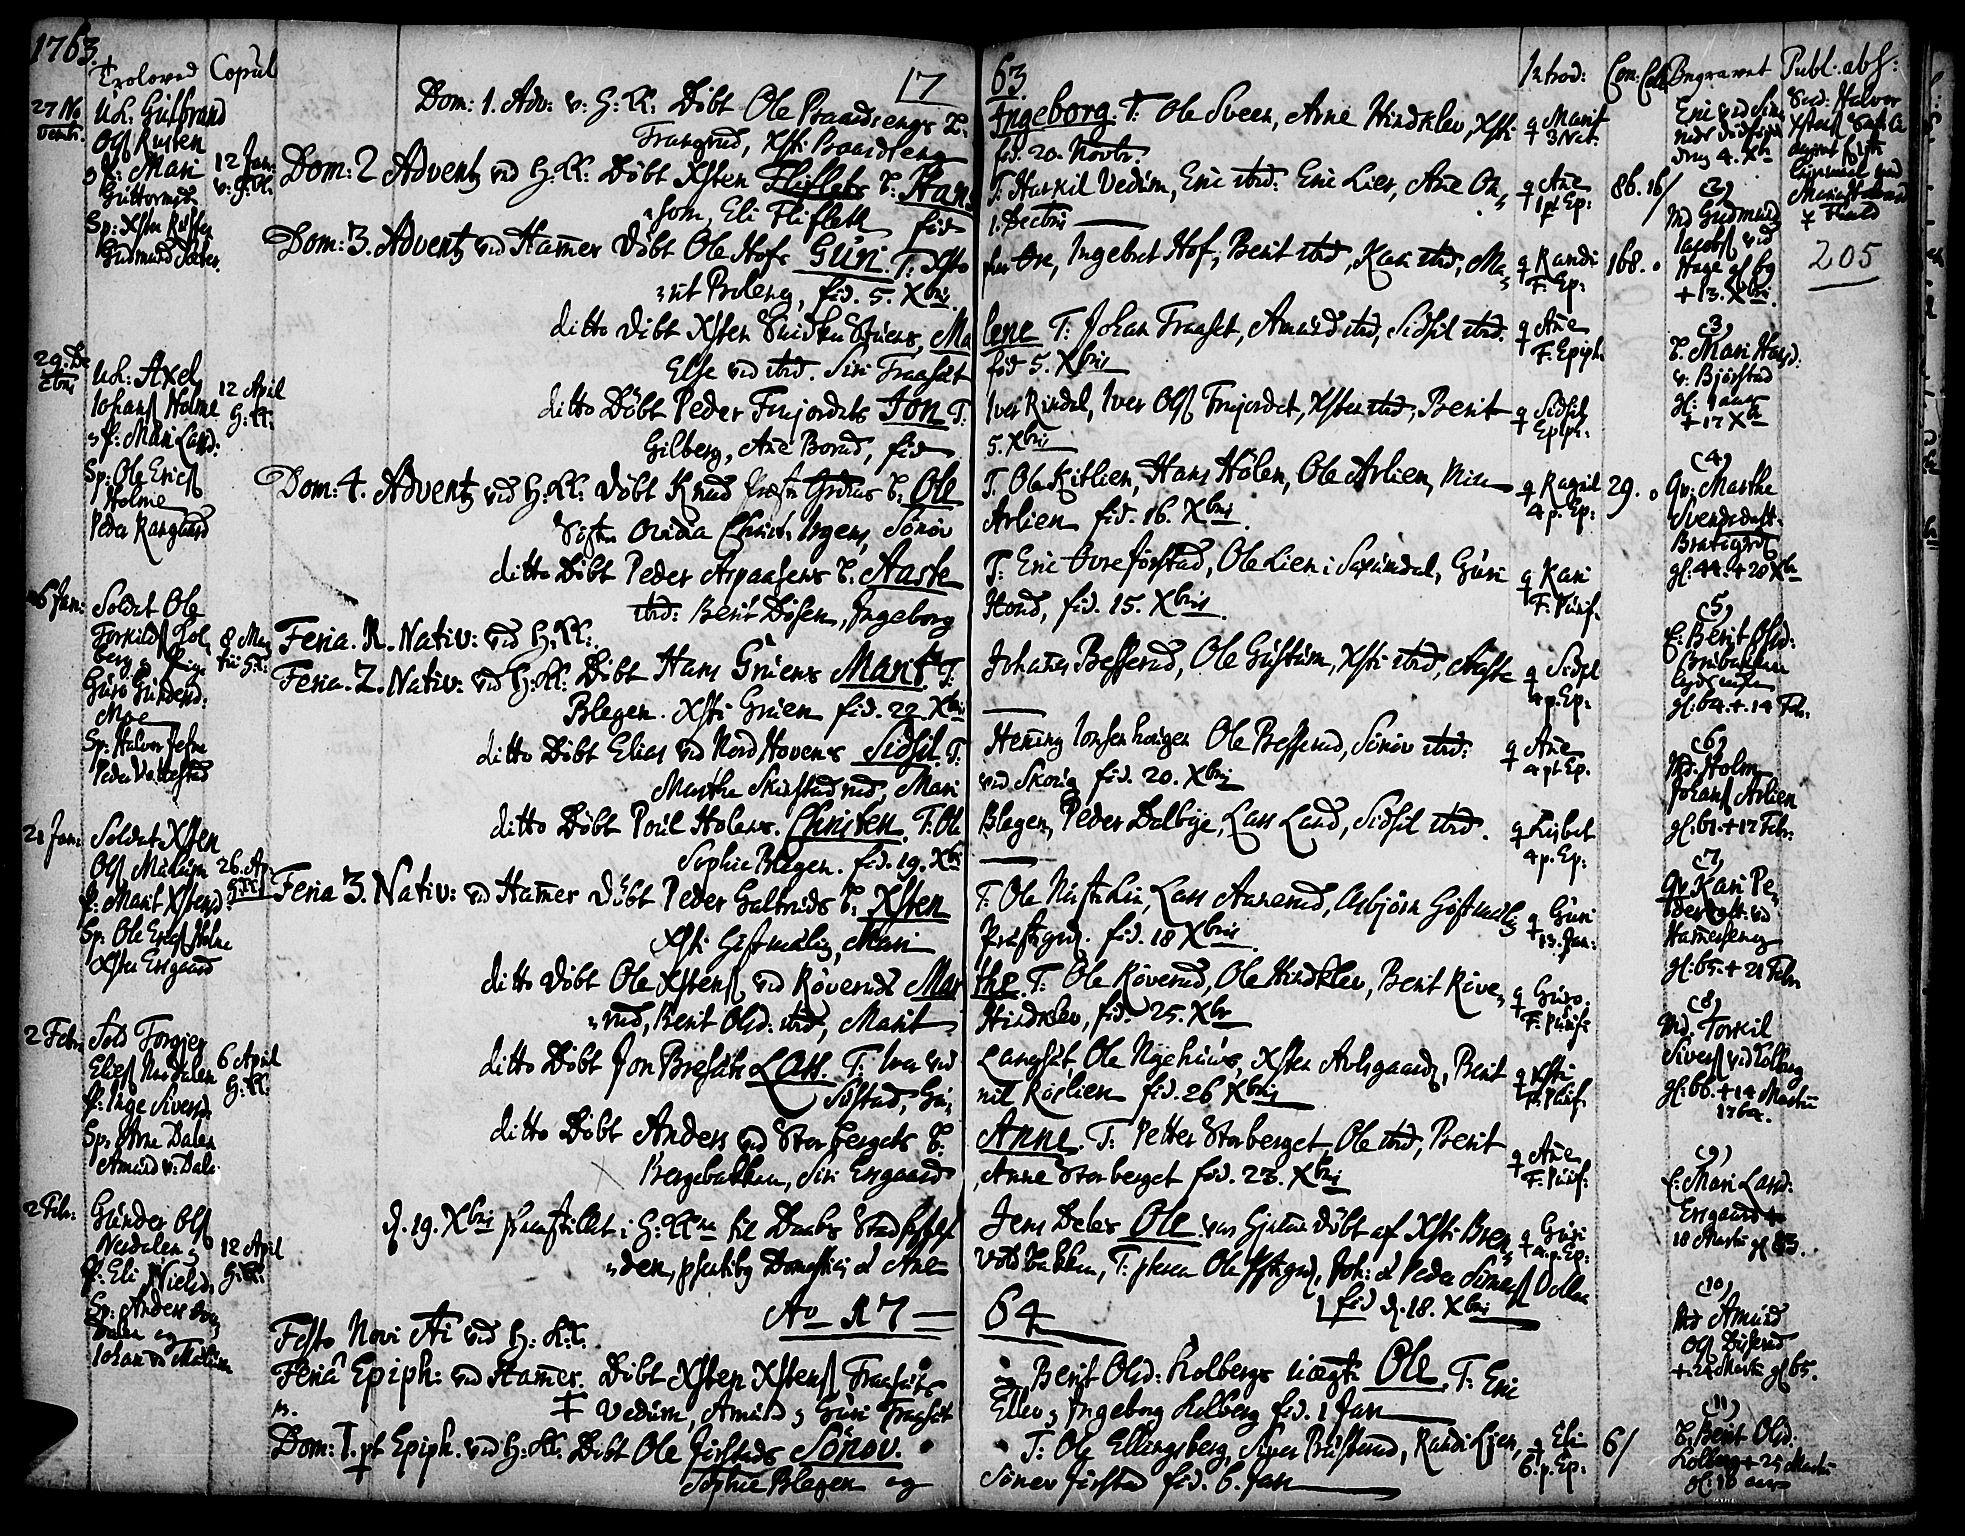 SAH, Fåberg prestekontor, Ministerialbok nr. 1, 1727-1775, s. 205